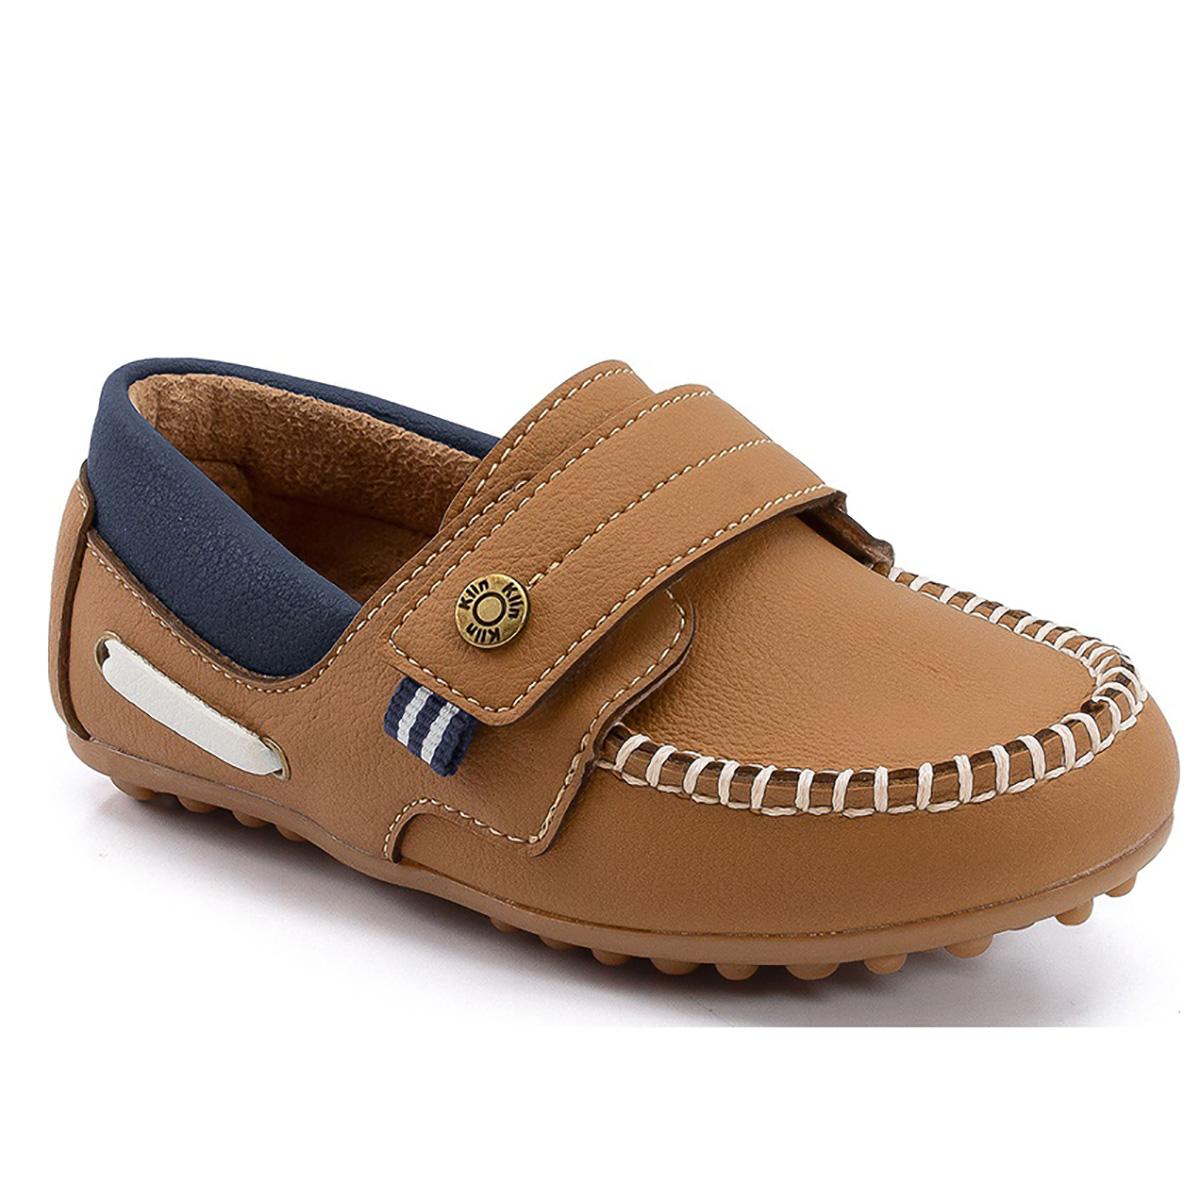 Sapato Klin Curumim Masculino Infantil